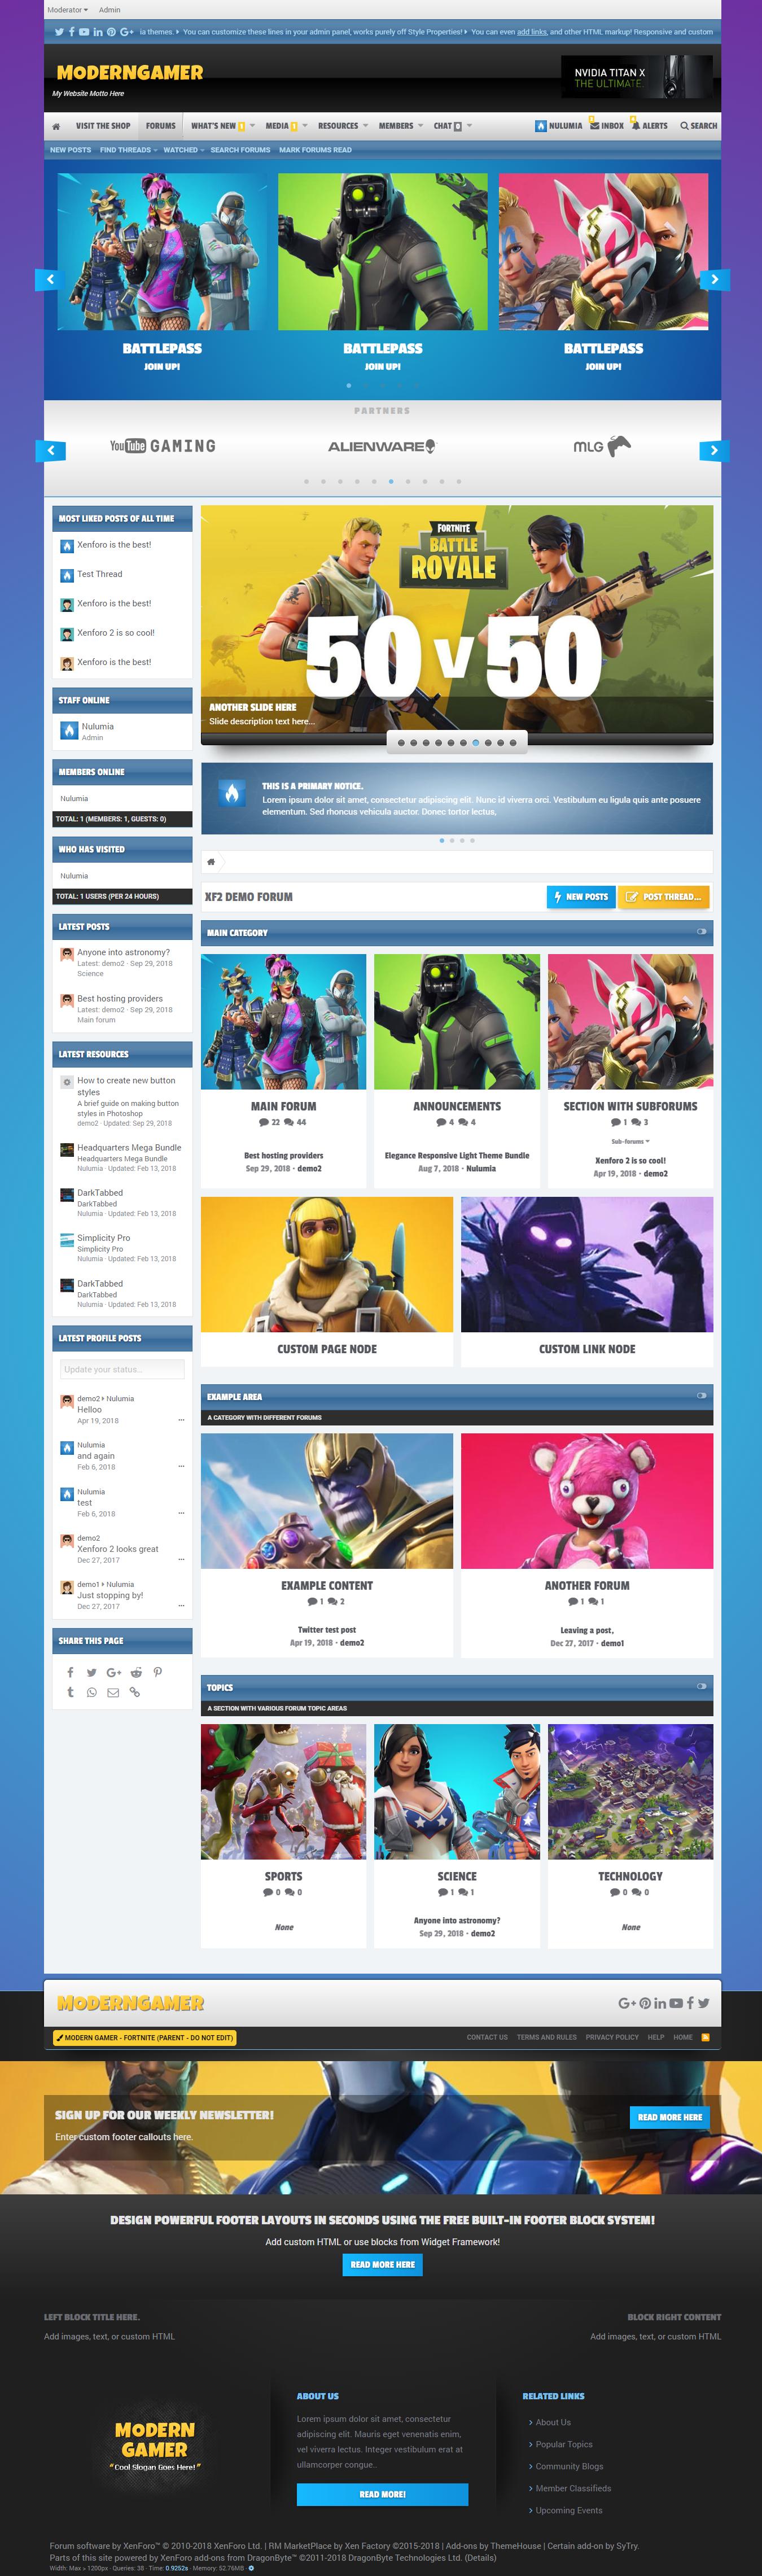 Modern Gamer - Powerful Gaming Portal Xenforo 2 Theme Bundle